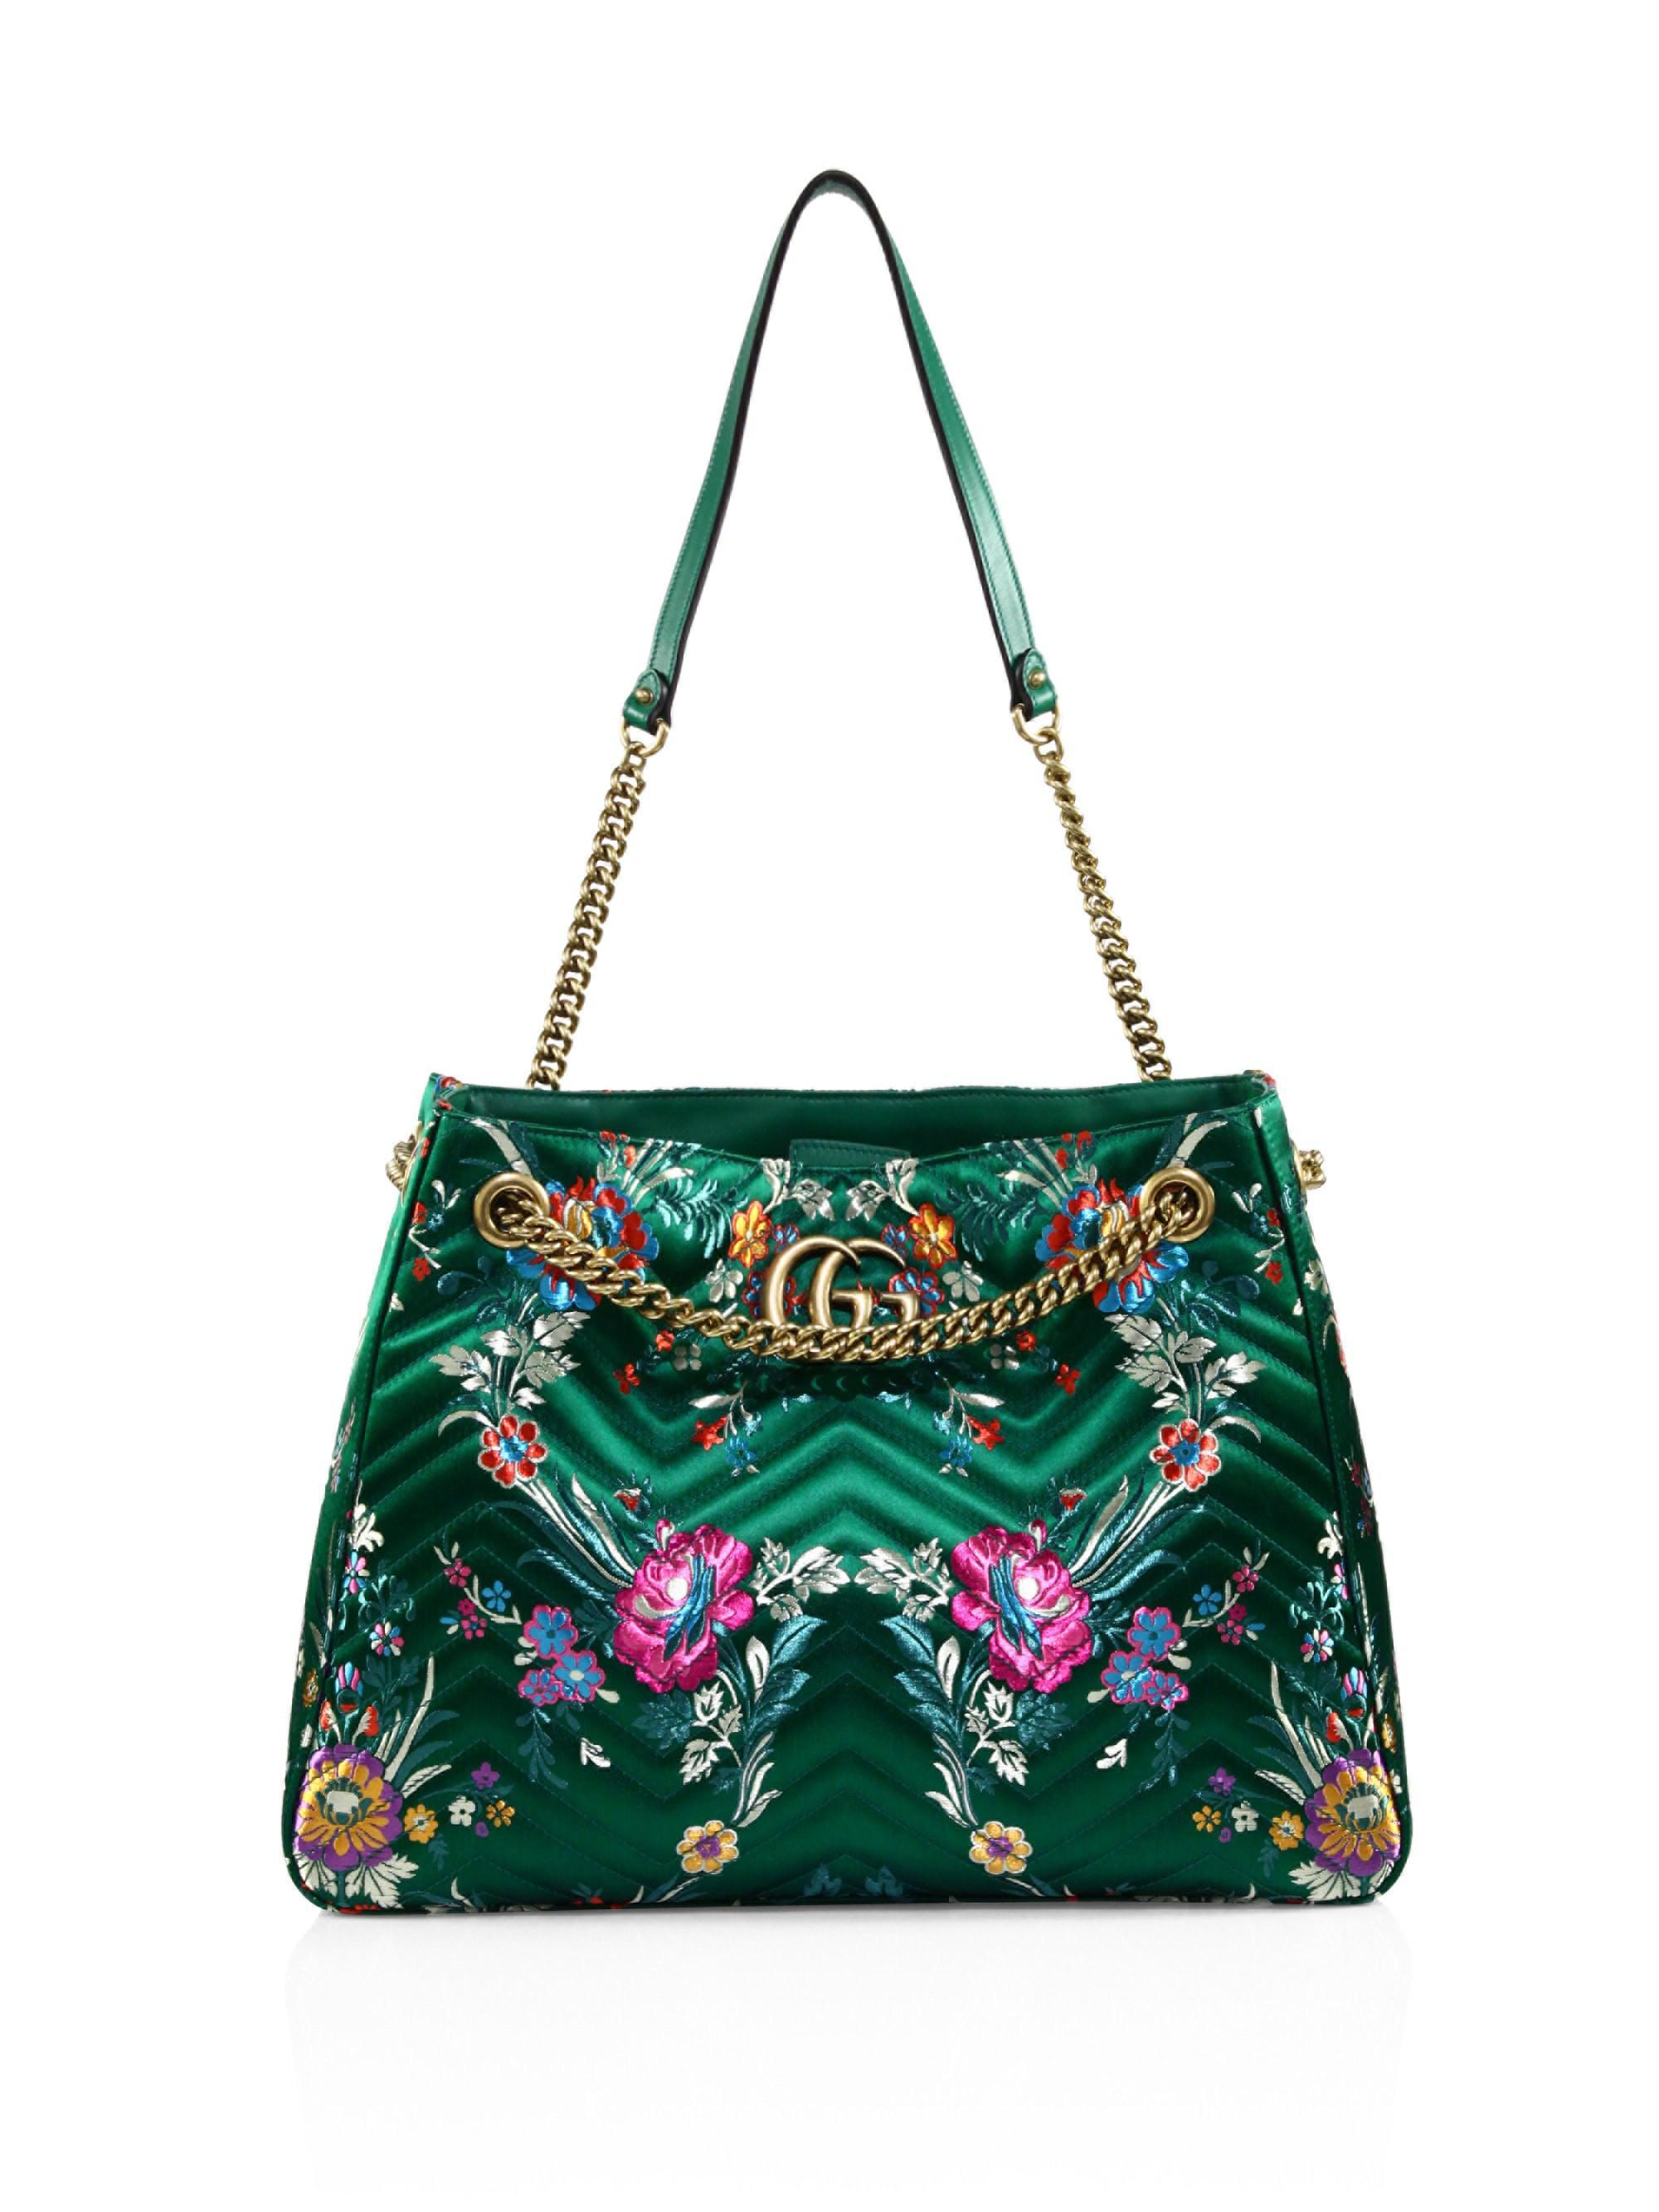 b17ec859b06738 Gucci Medium GG Marmont Matelassé Floral Jacquard Chain Shoulder Bag ...